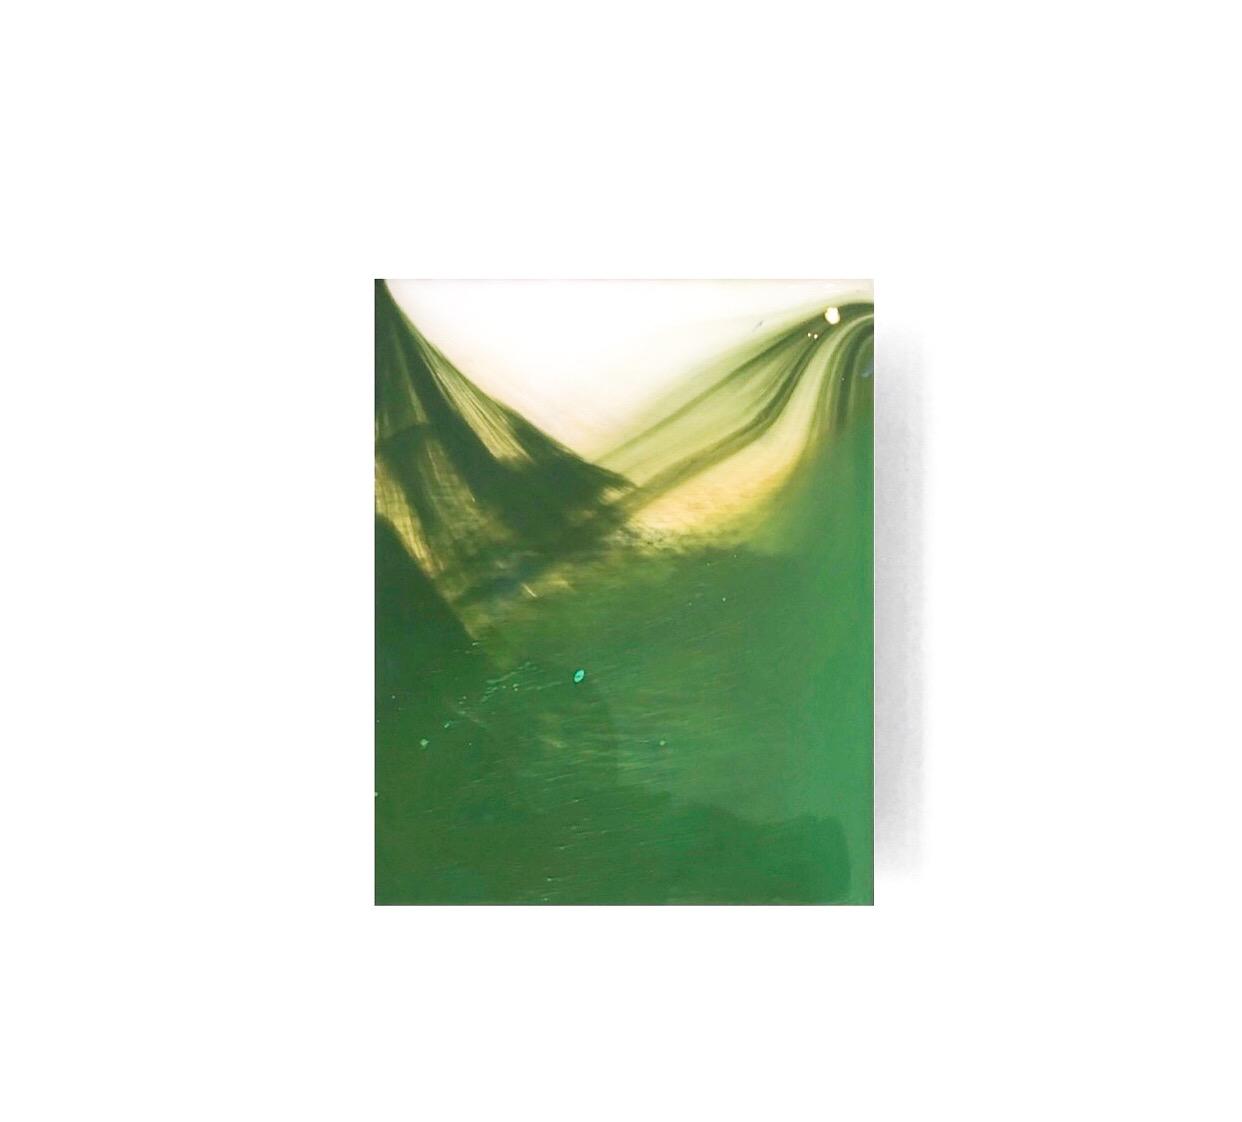 epoxy resin tablet 3.JPG